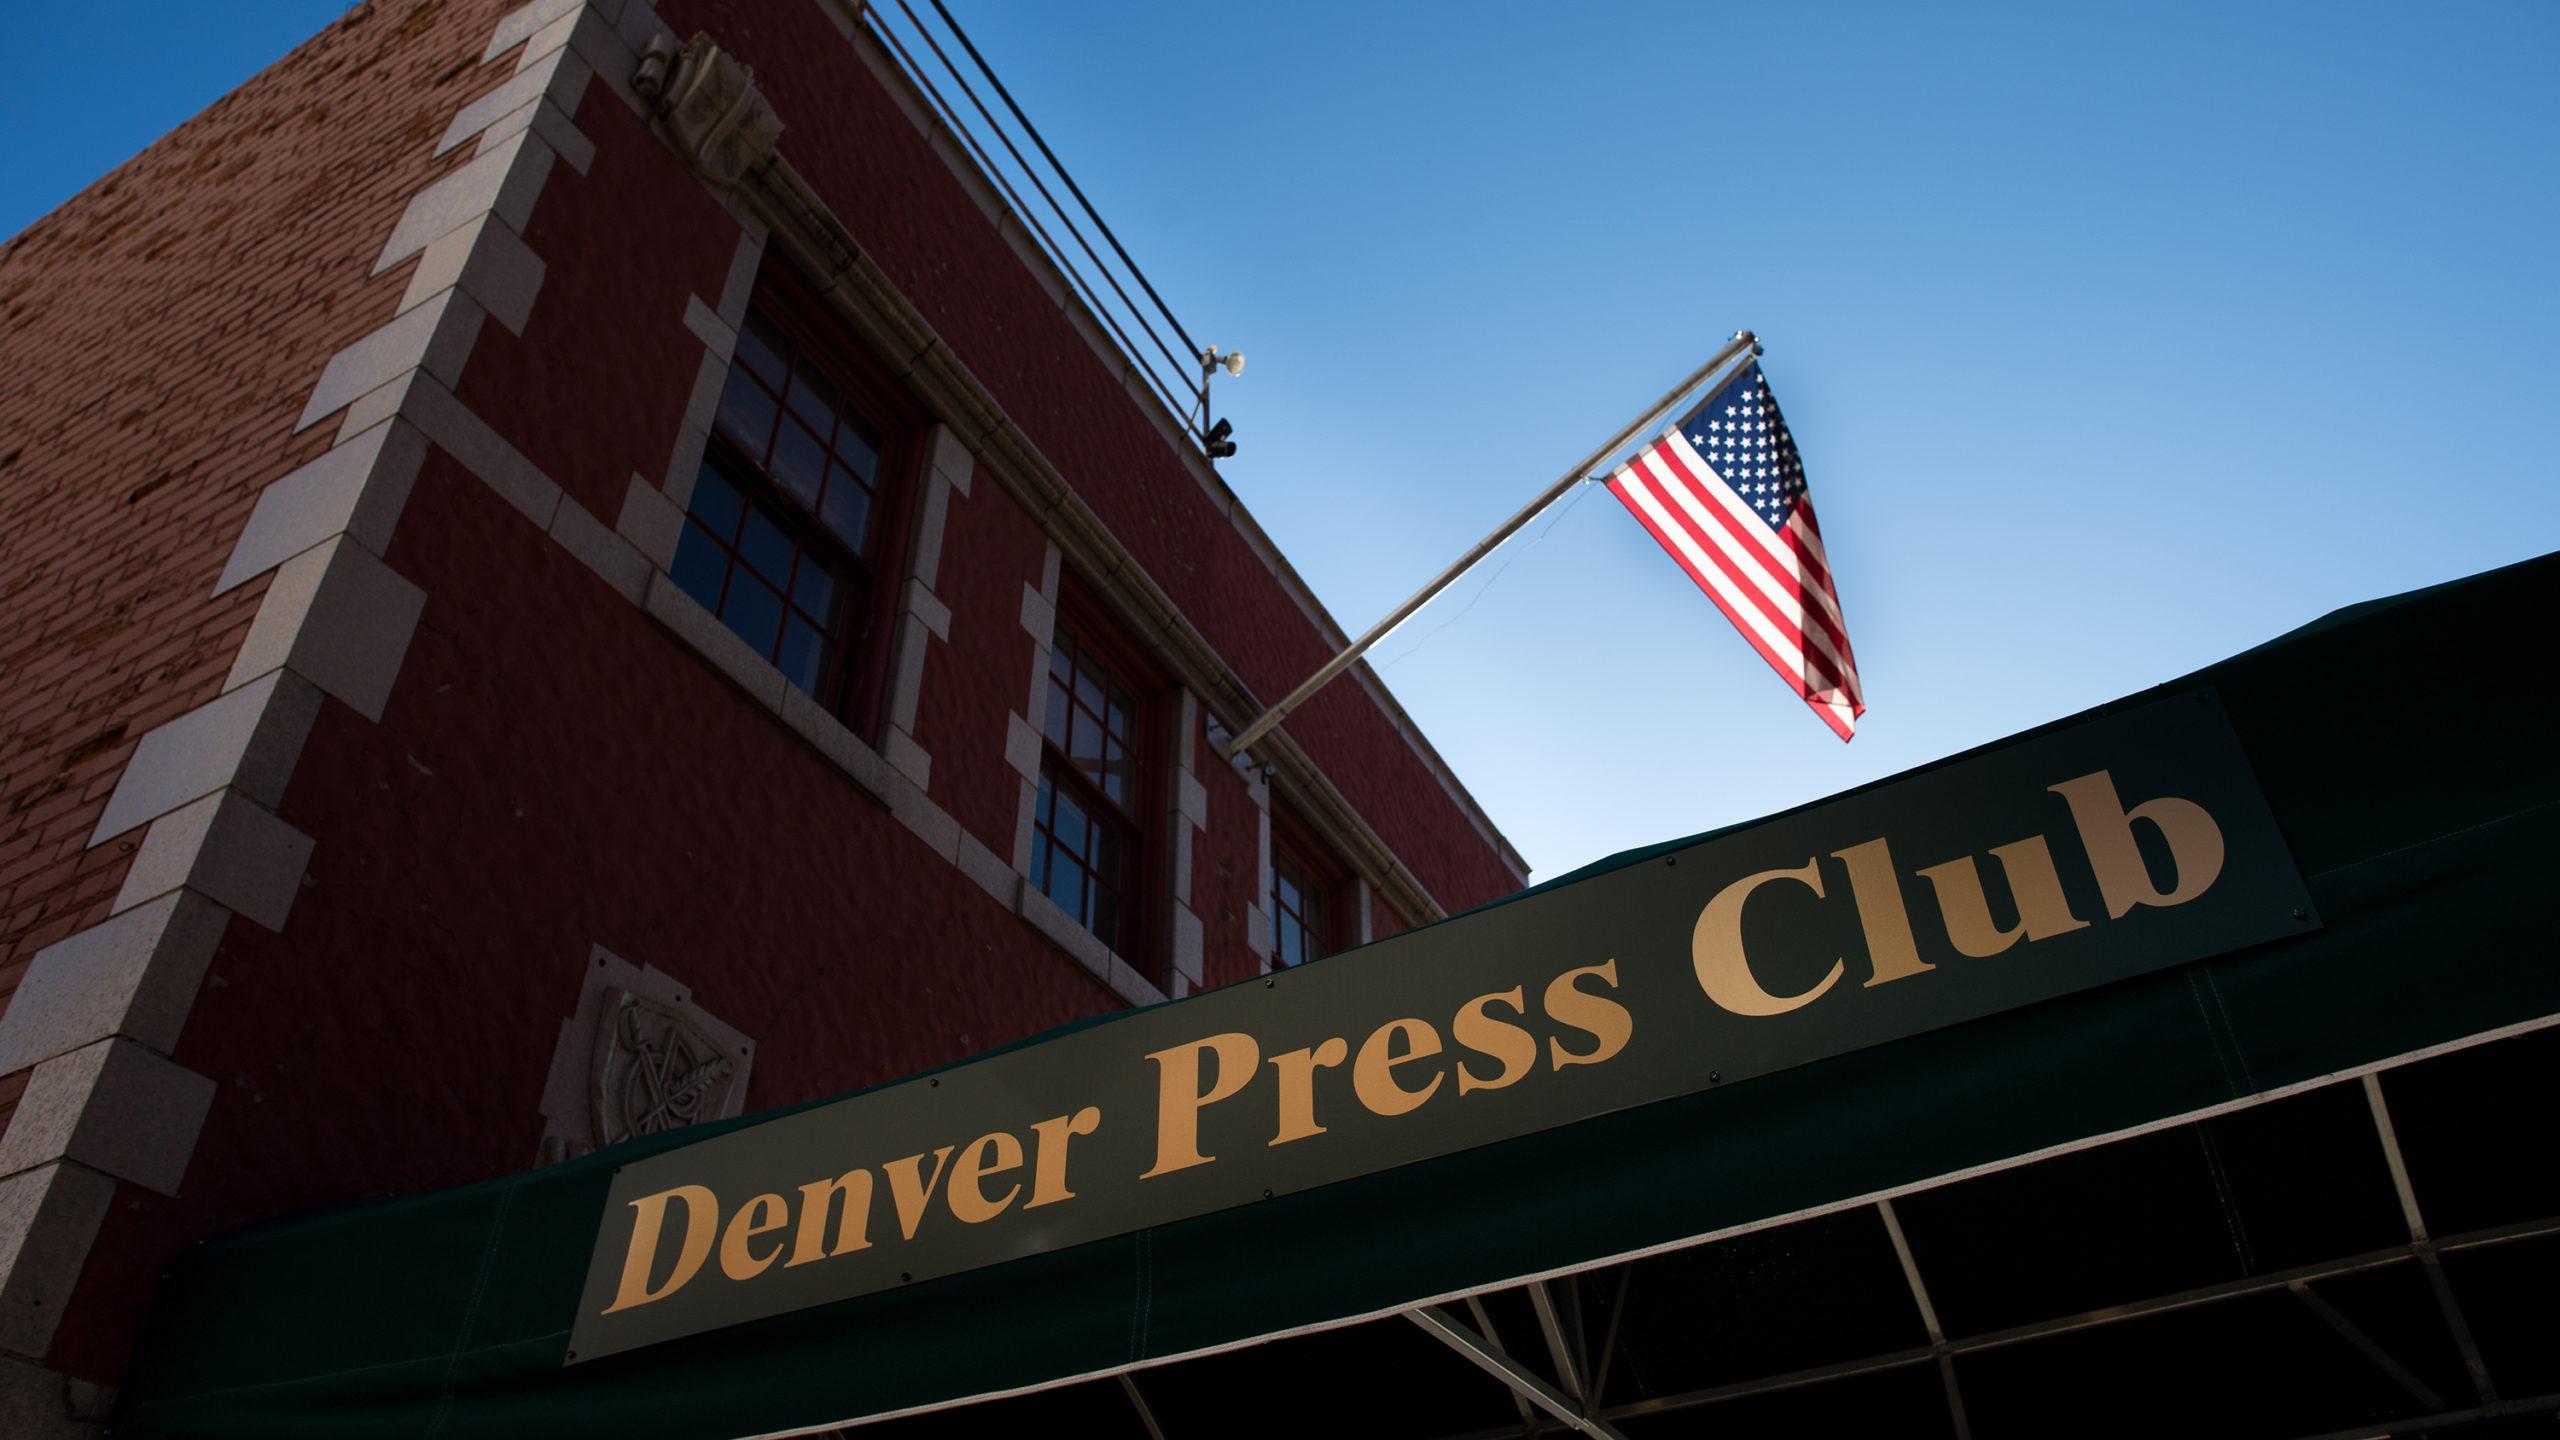 The Denver Press Club building exterior in 2017